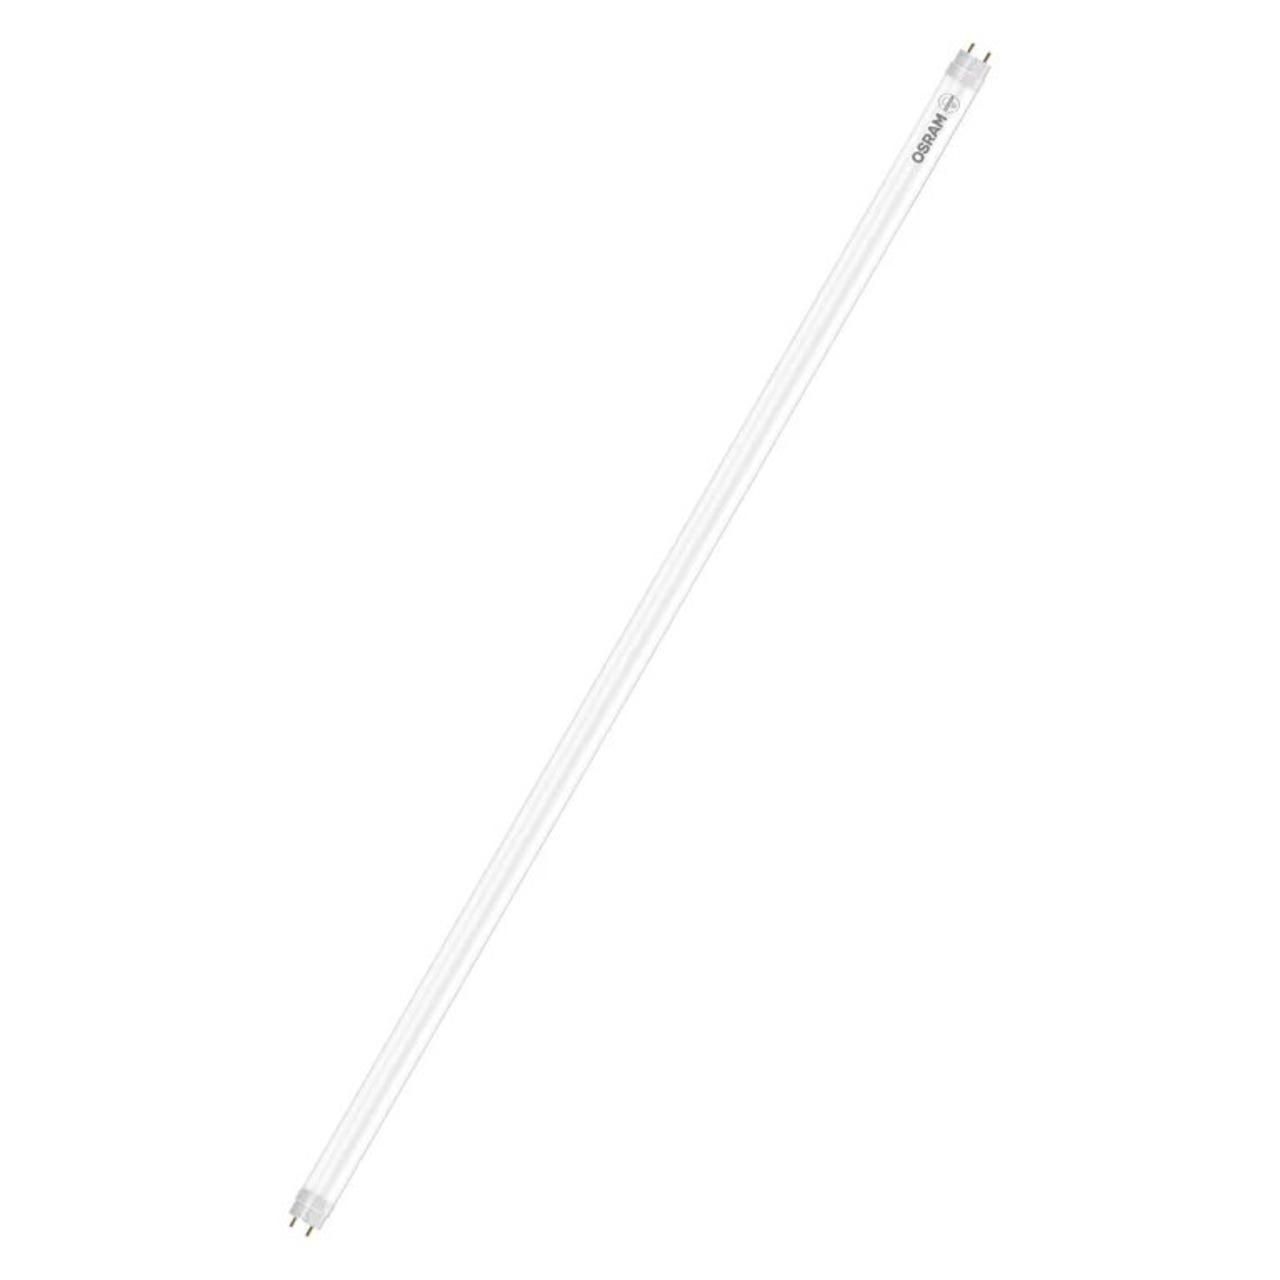 OSRAM SubstiTUBE Star 20-W-T8-LED-Röhrenlampe- 150 cm- kaltweiss